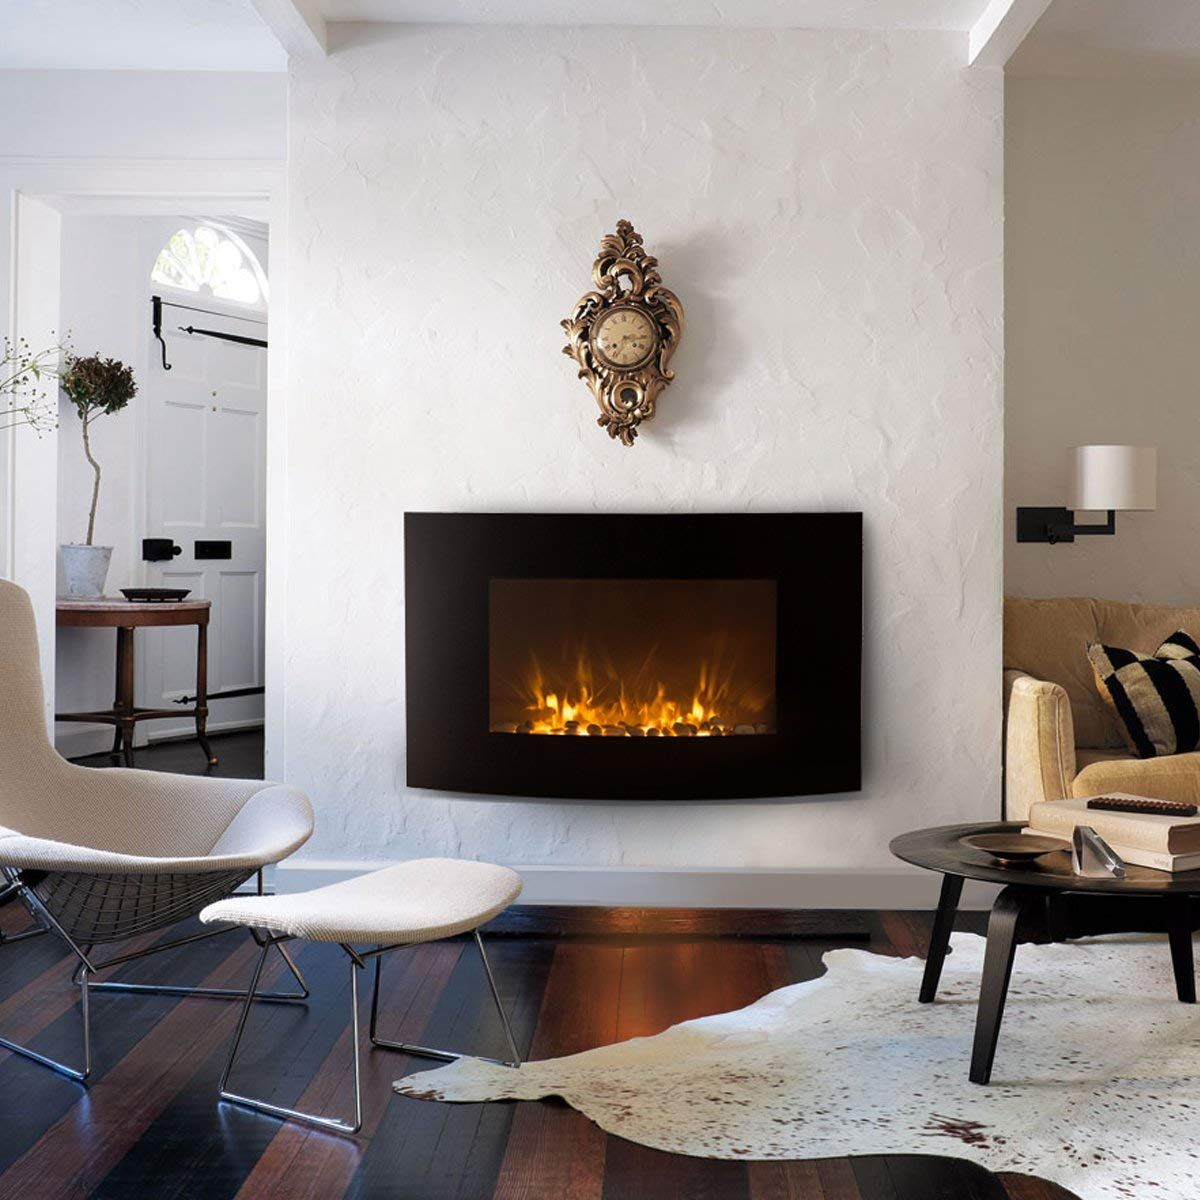 Xtremepowerus 35 Electric Wall Mount Fireplace 1500w Heat